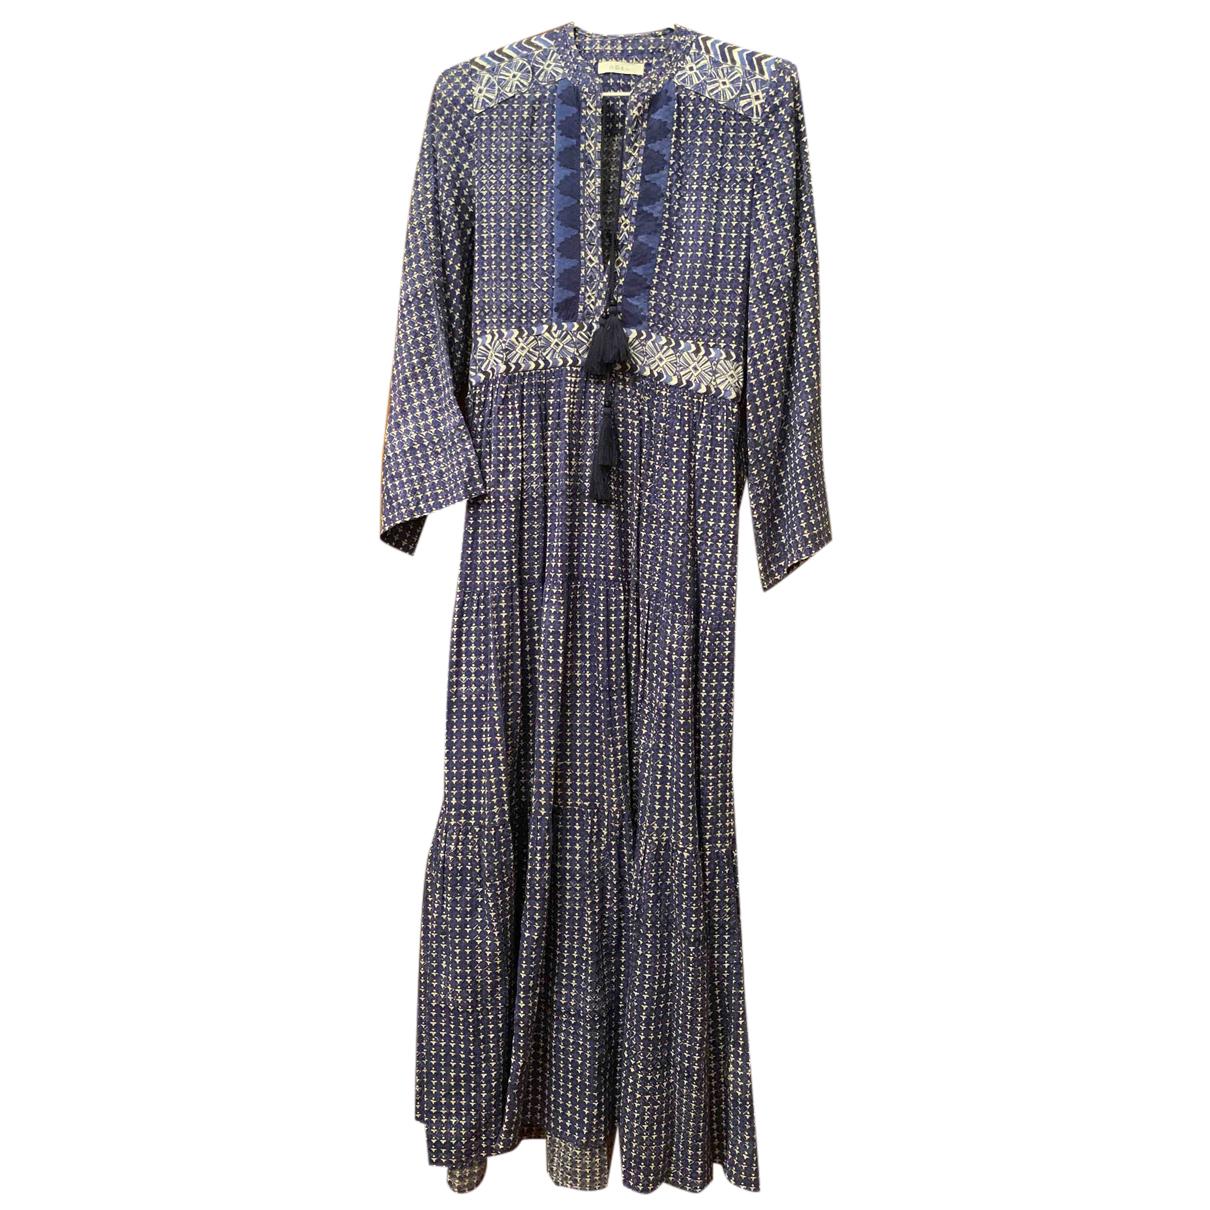 Dôen \N Blue Cotton dress for Women XS International